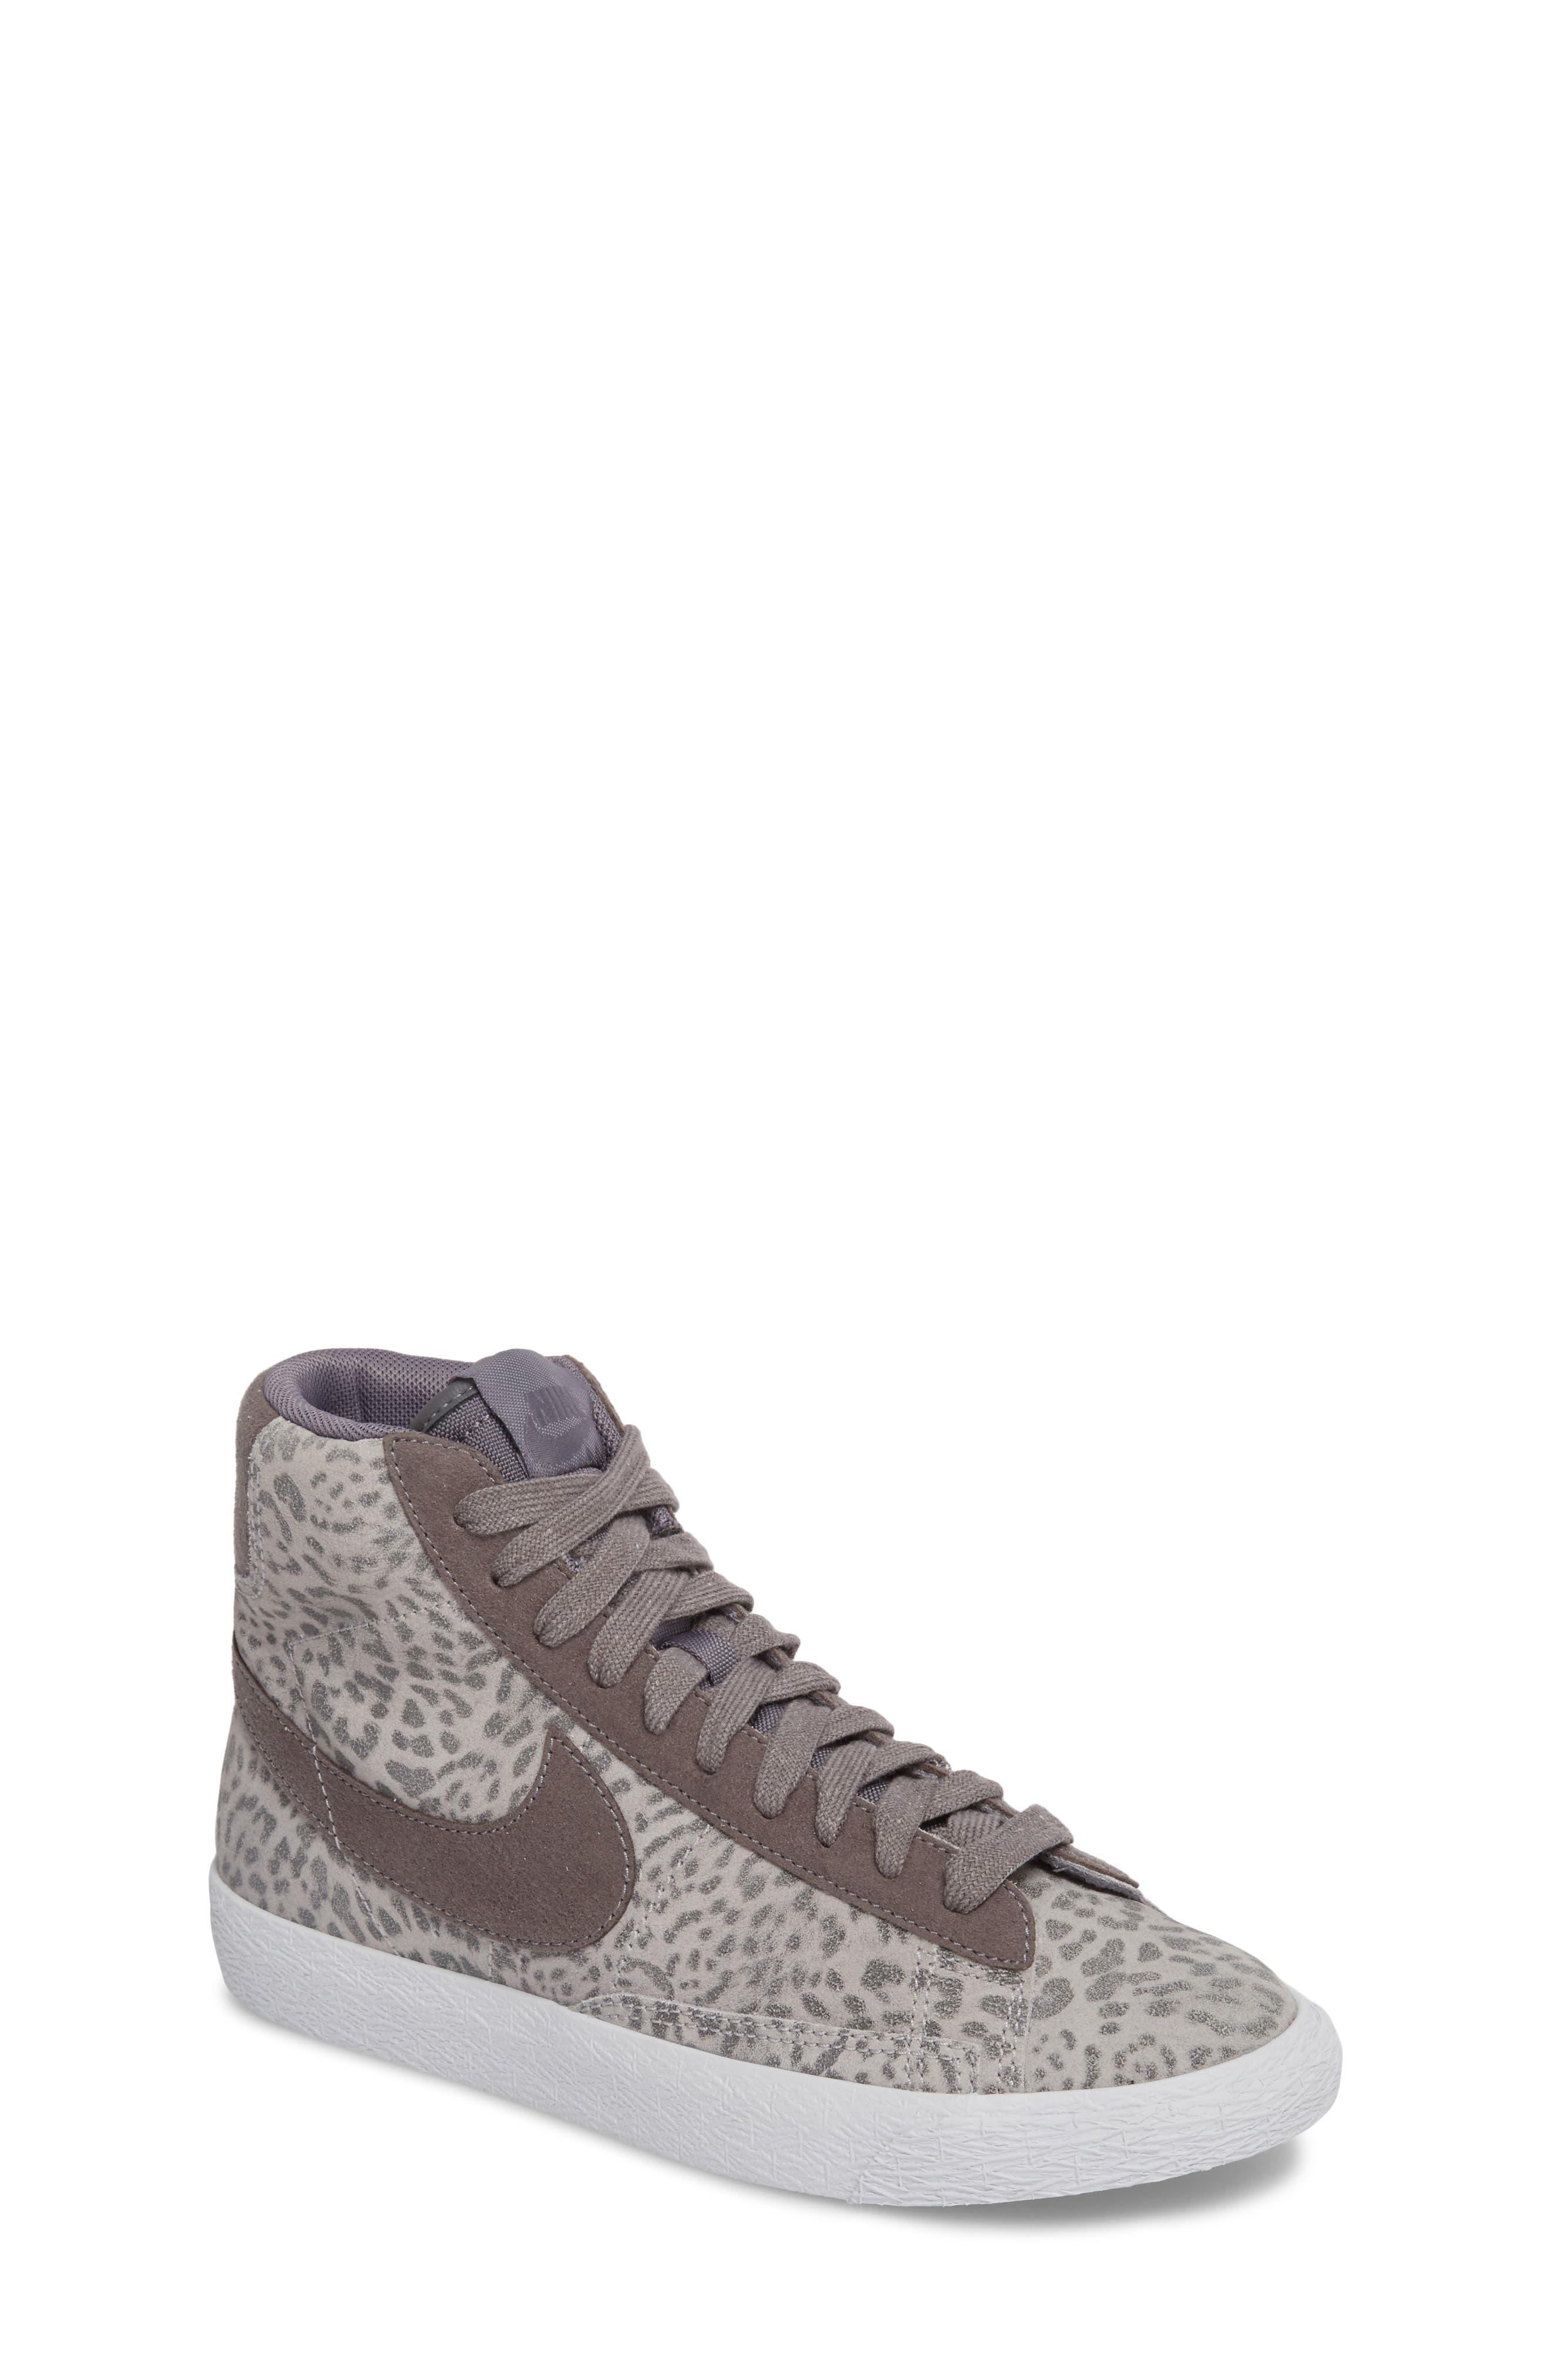 Blazer Mid SE High Top Sneaker,                             Main thumbnail 1, color,